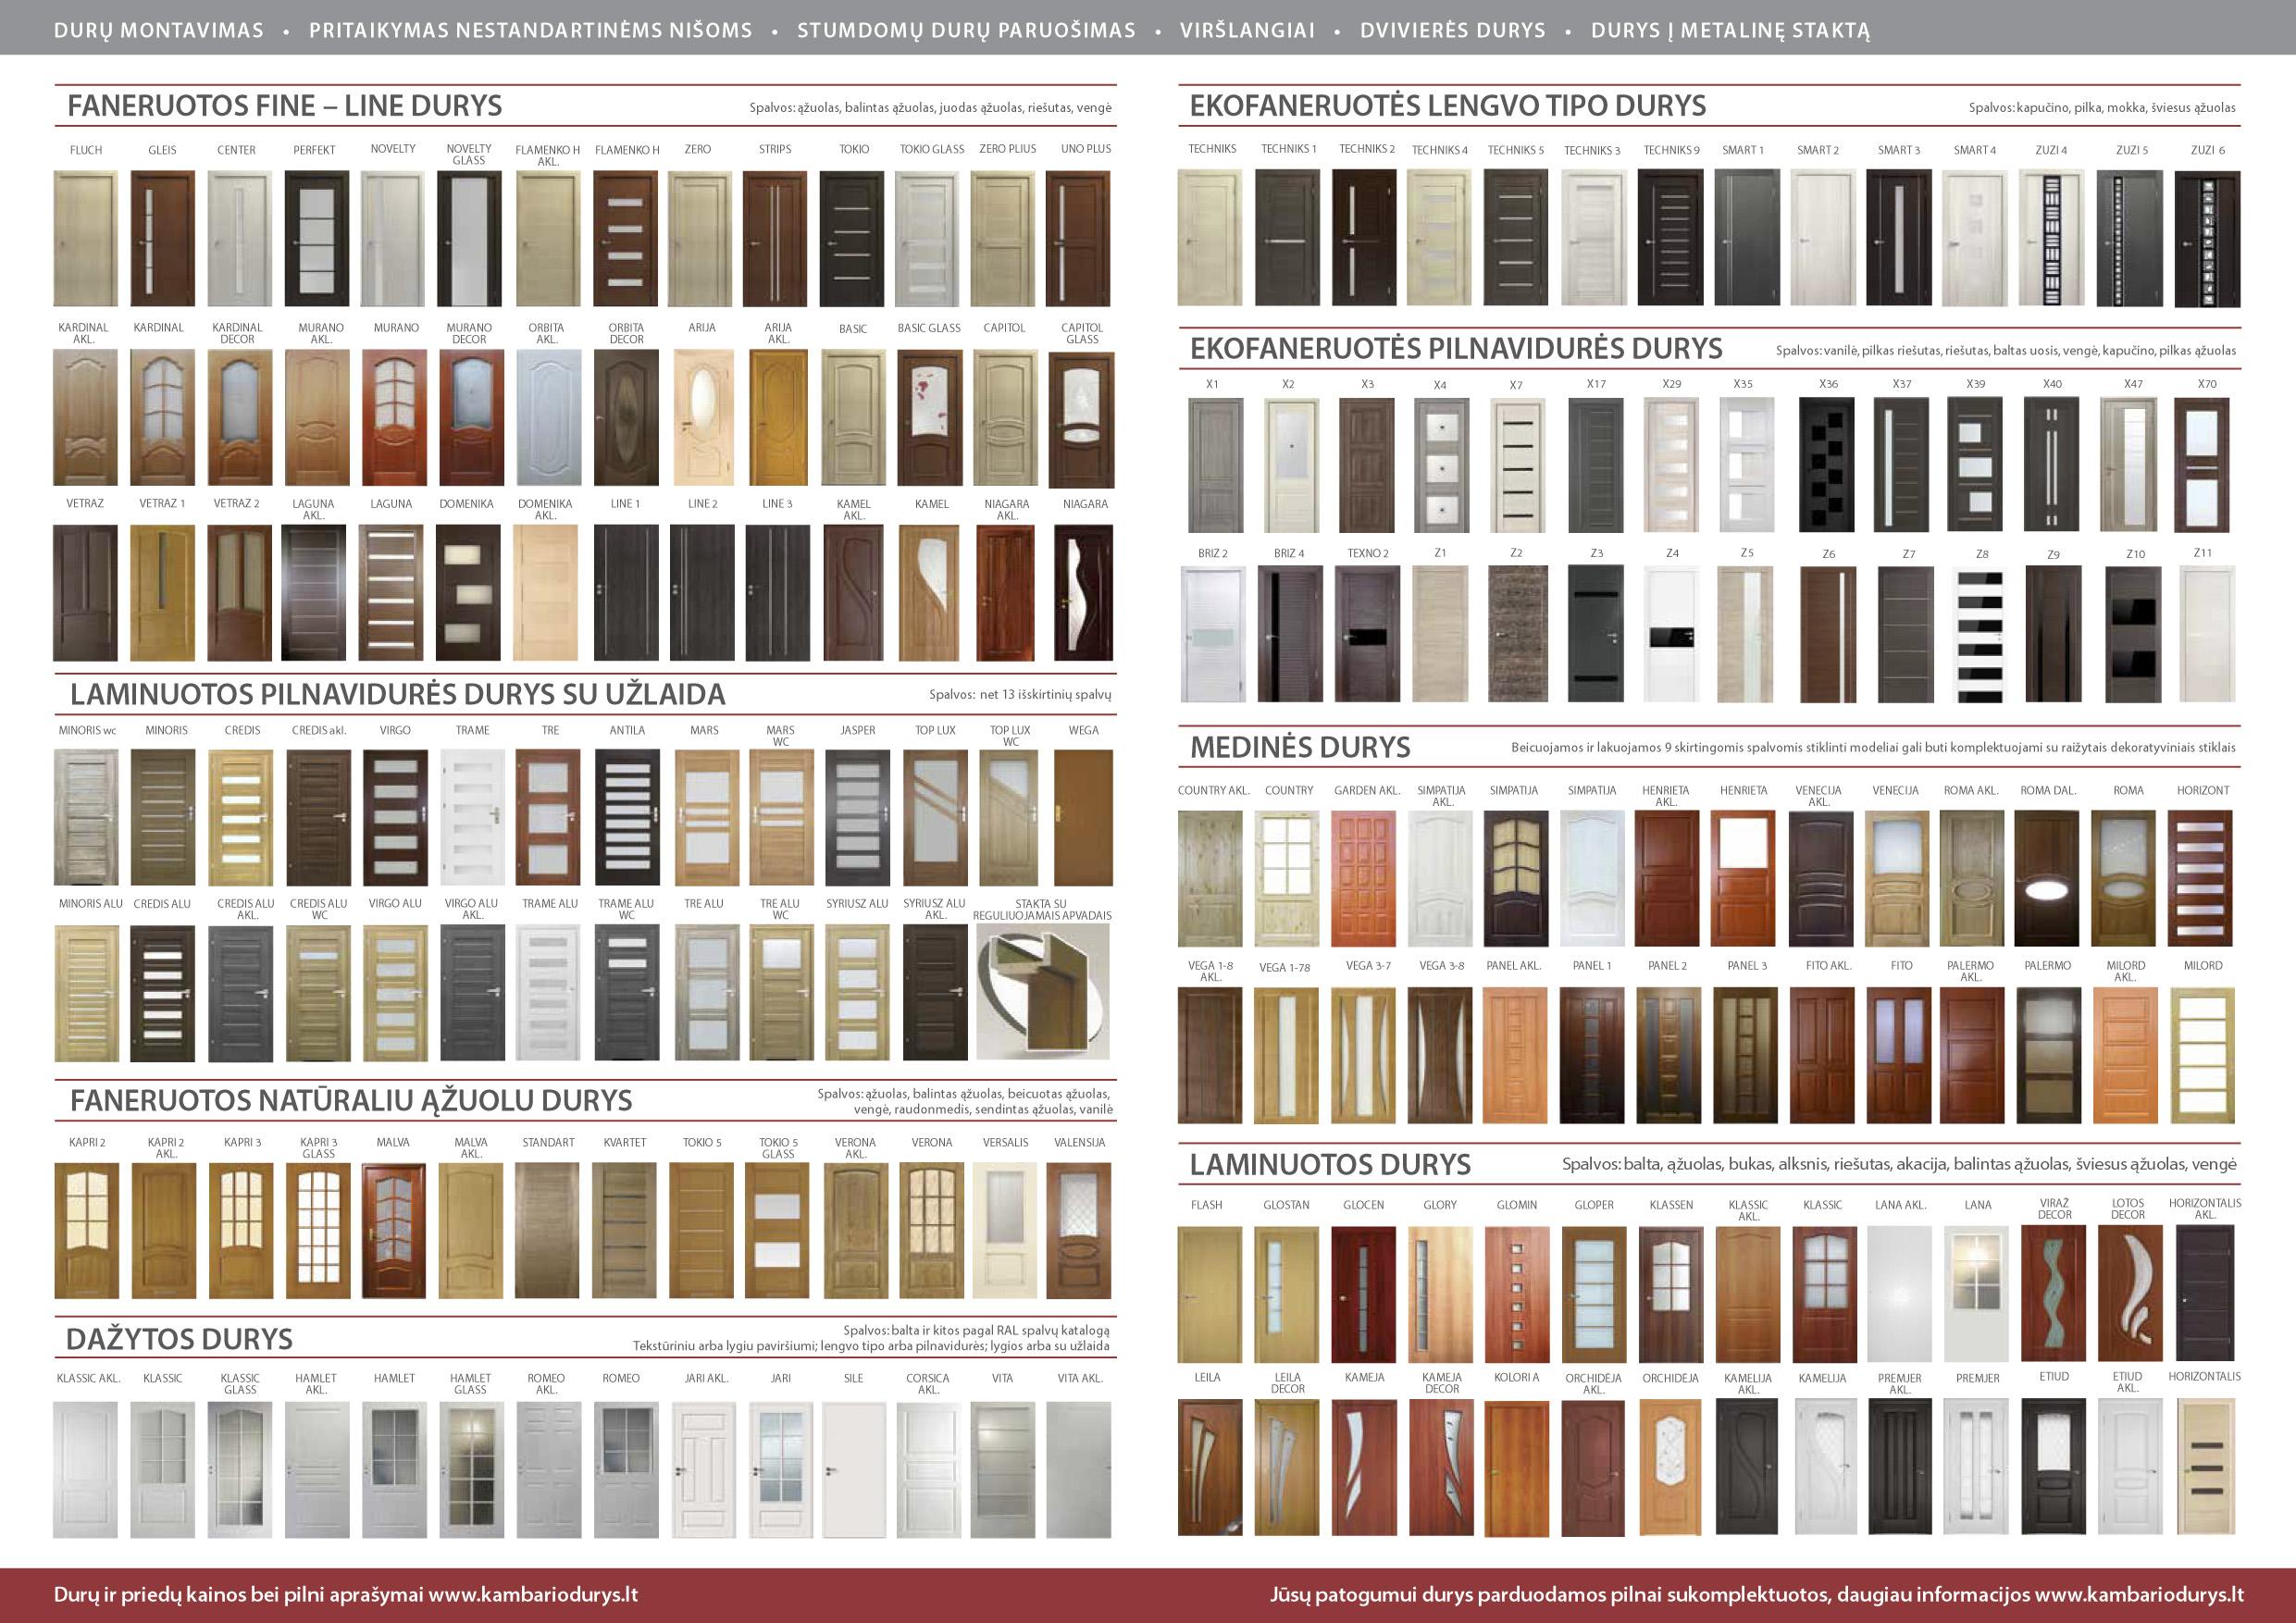 Kmabario durų katalogas